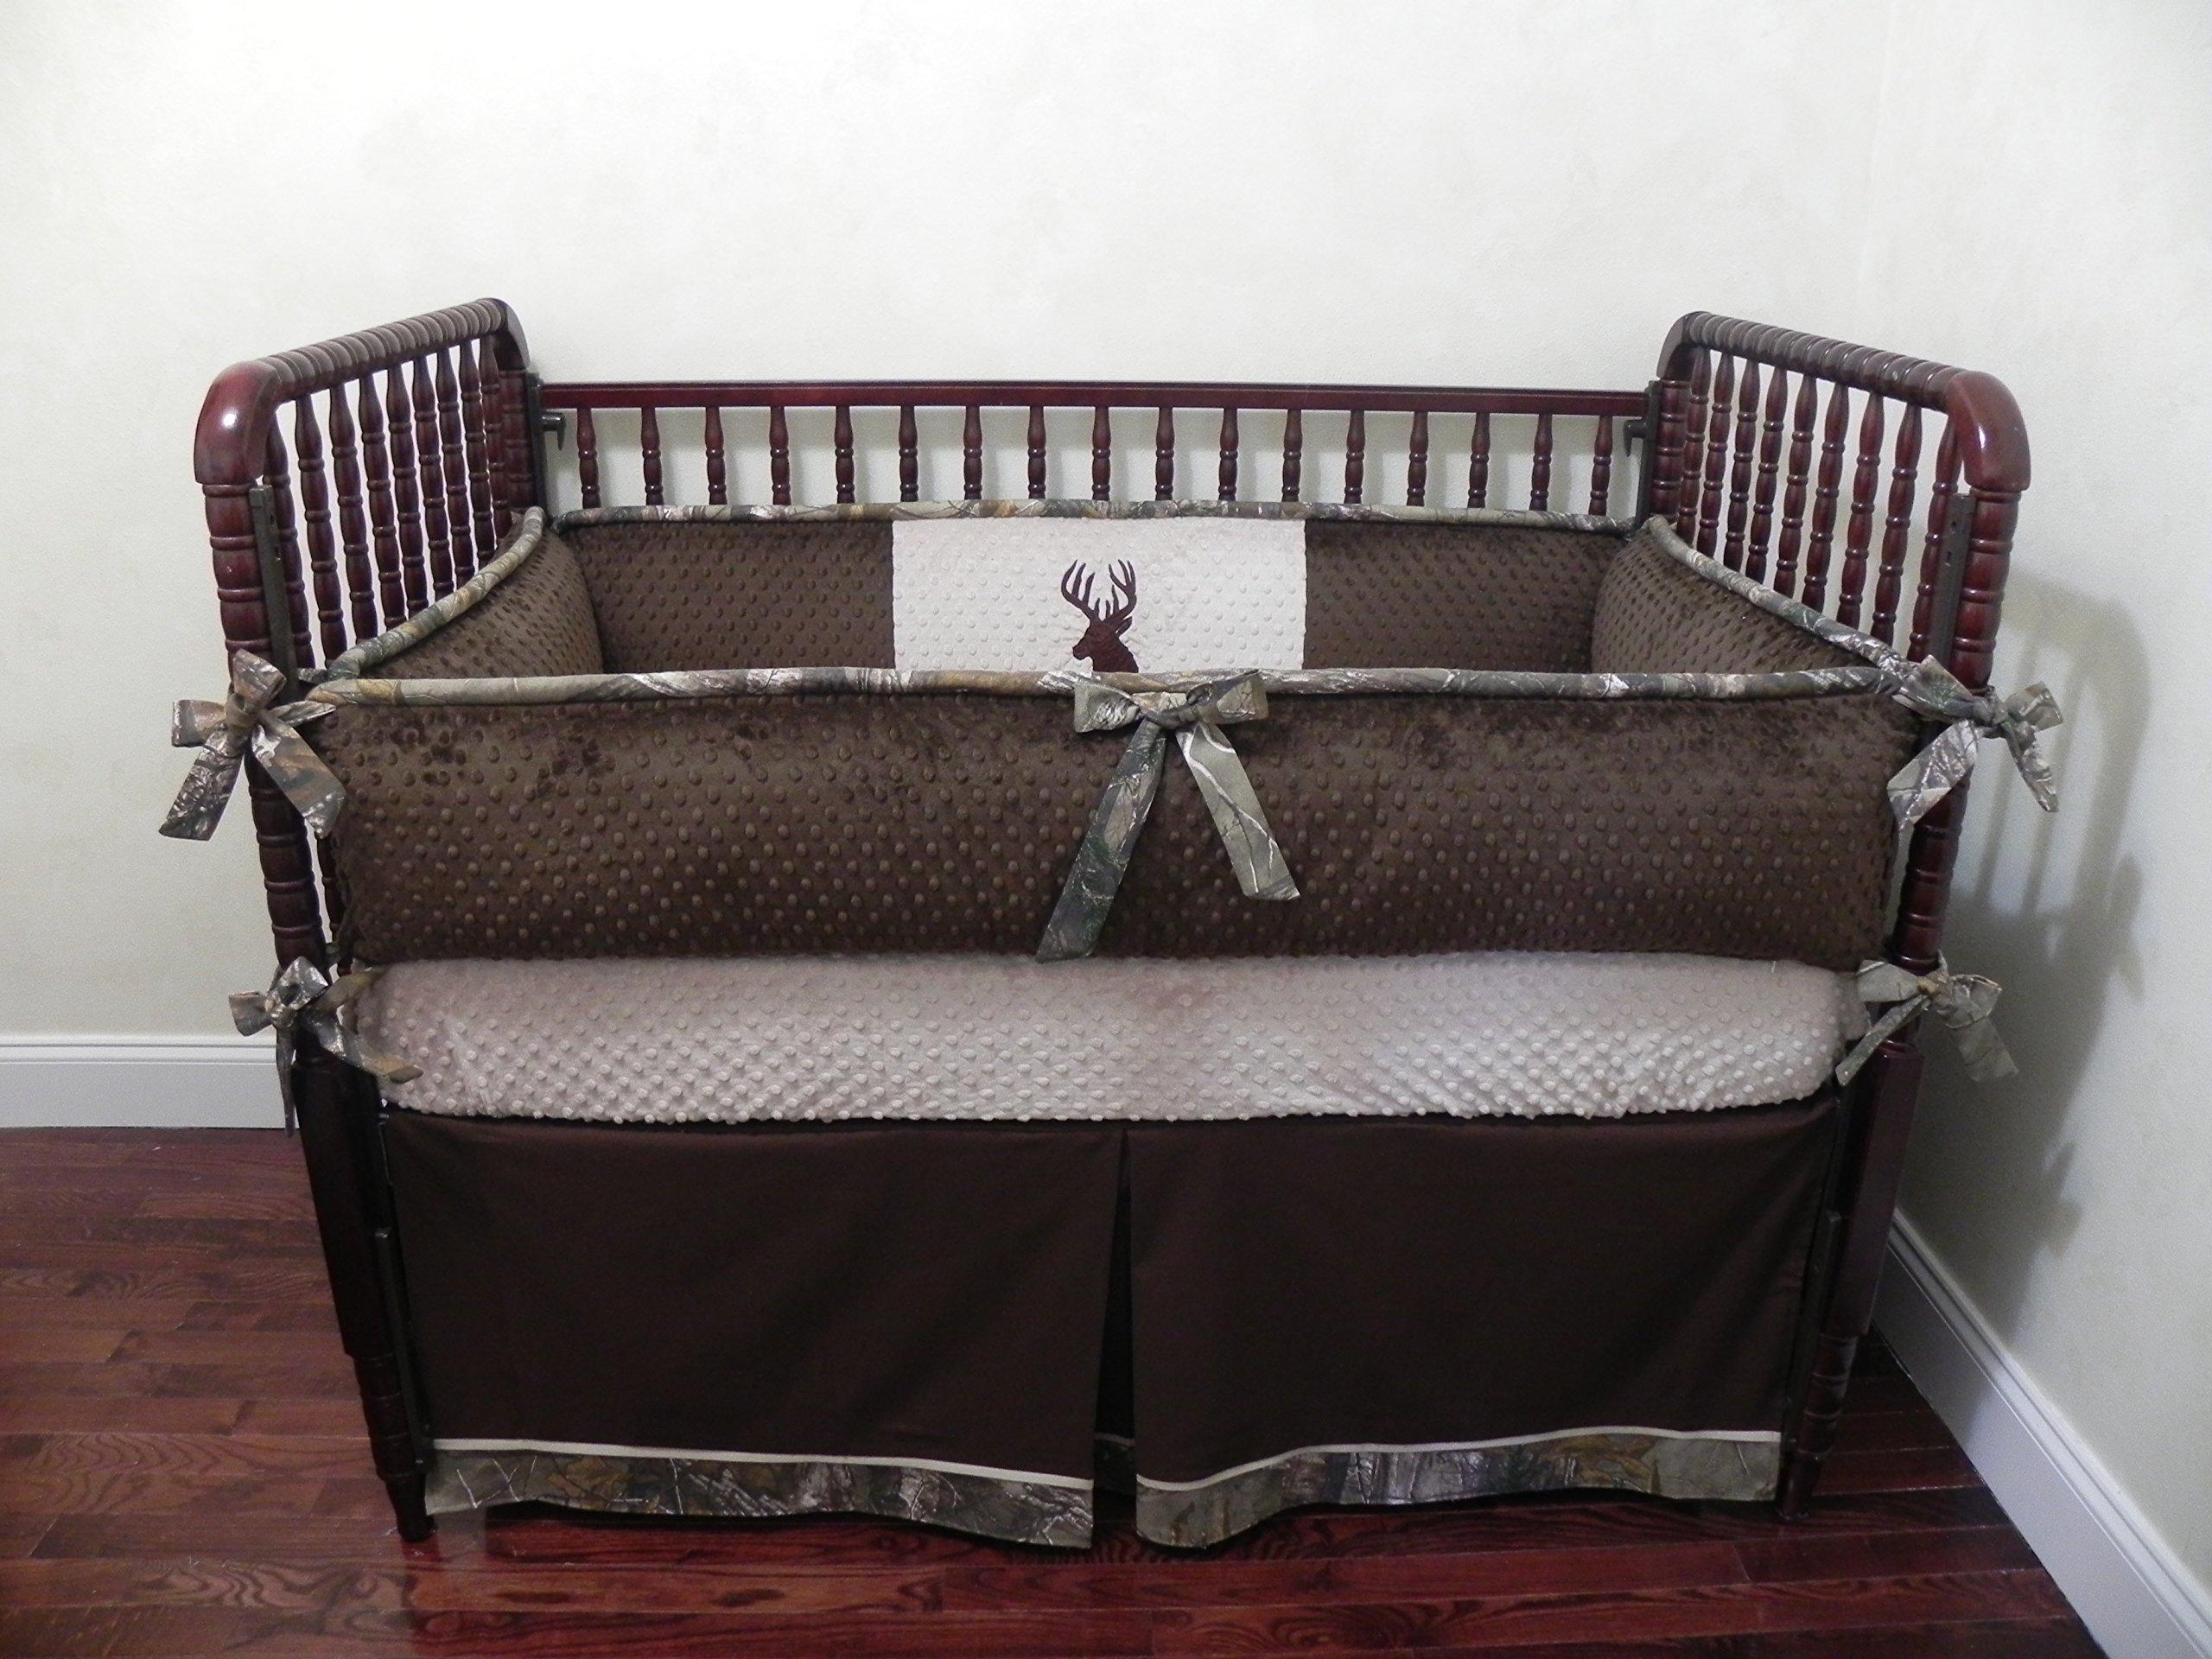 Nursery Bedding, Baby Crib Bedding Set Paxton, Boy Baby Bedding, Deer Crib Bedding, Woodlands Nursery Bedding - Choose Your Pieces